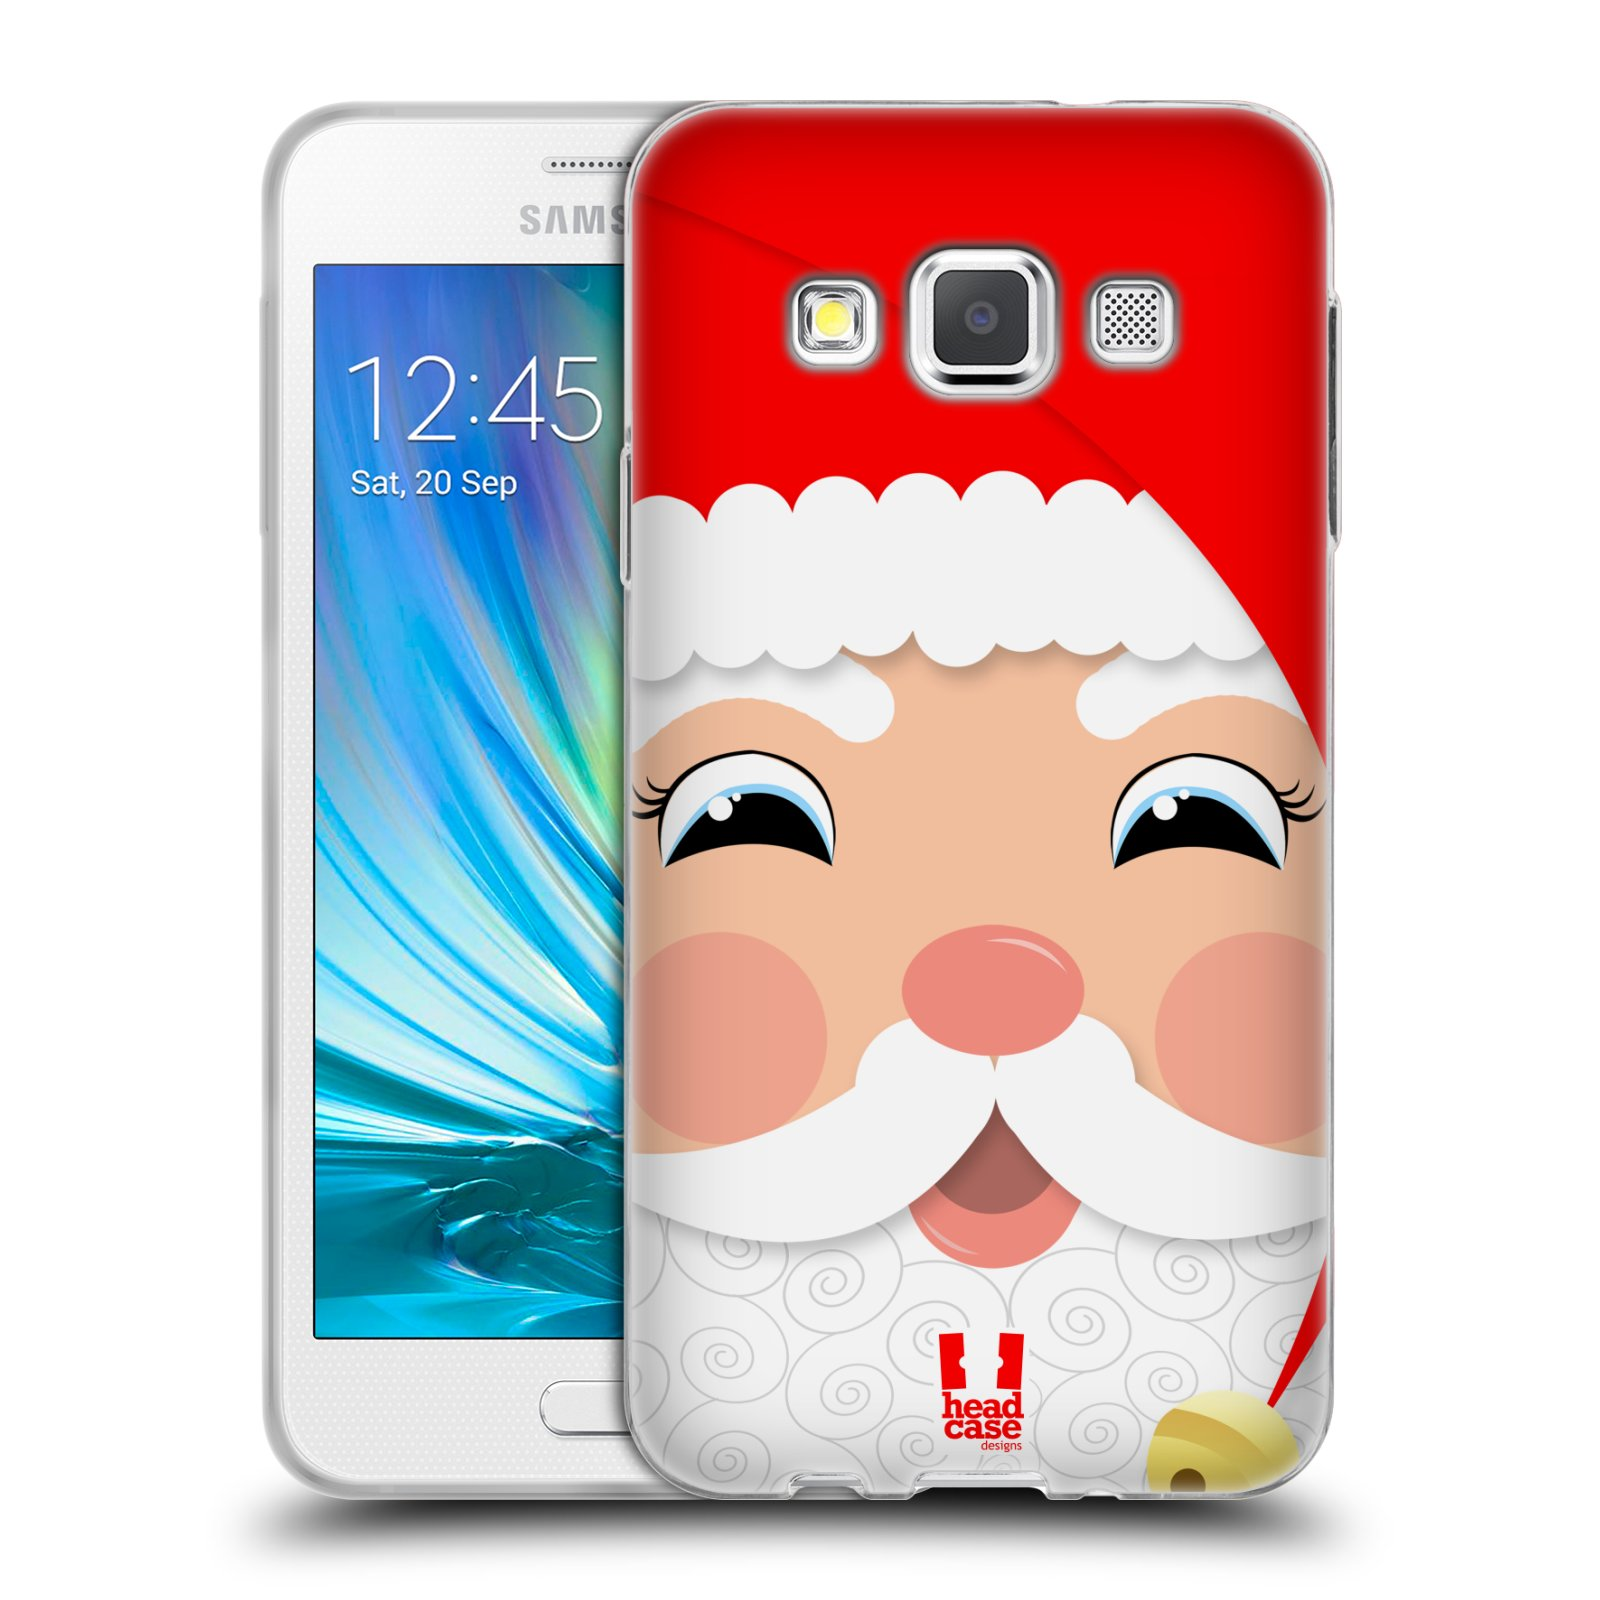 HEAD CASE silikonový obal na mobil Samsung Galaxy A3 vzor Vánoční tváře kreslené SANTA CLAUS